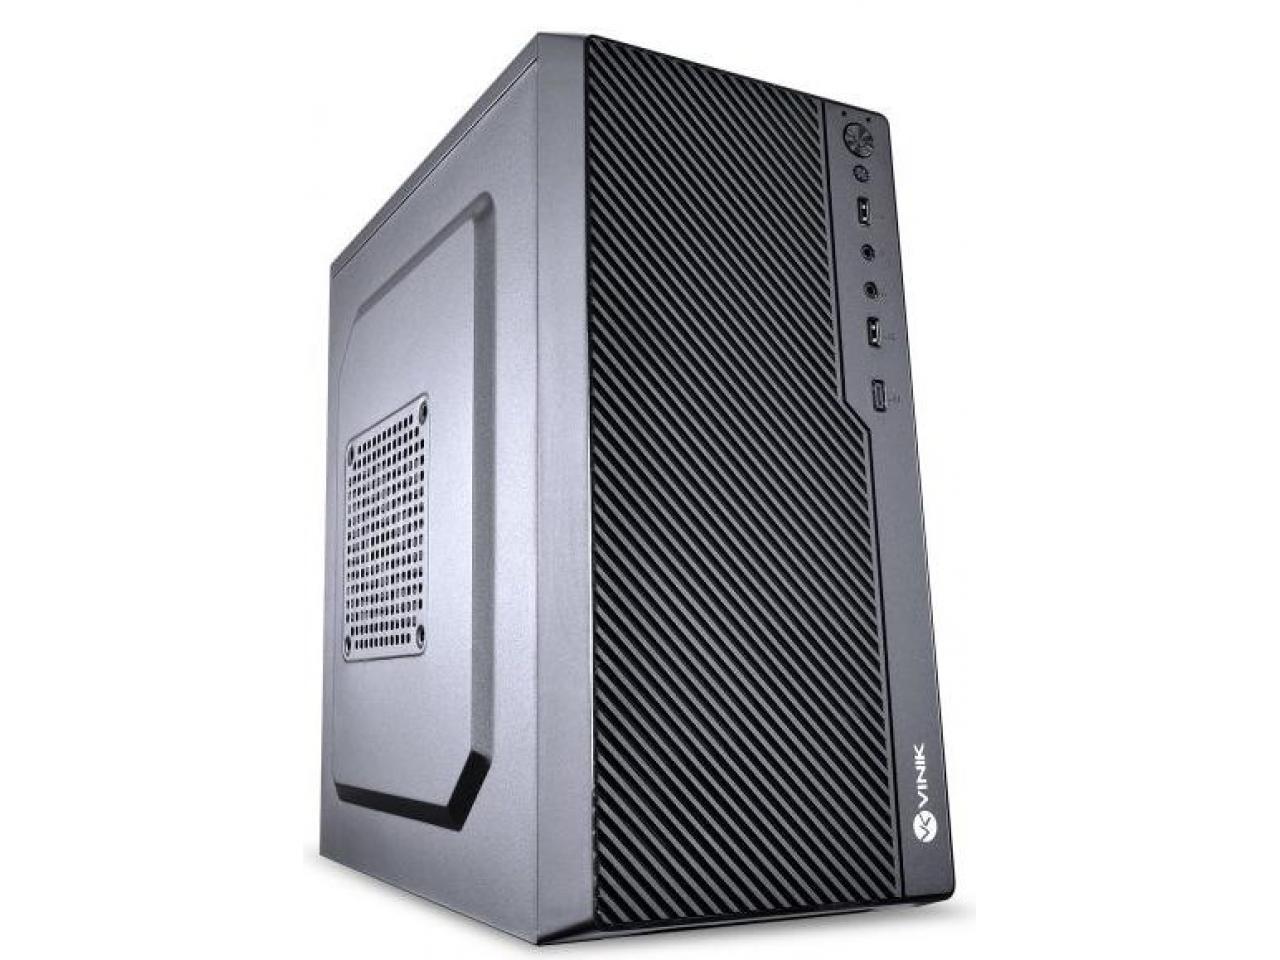 Gabinete  ATX Preto para PC Corporativo One M1 Vinik